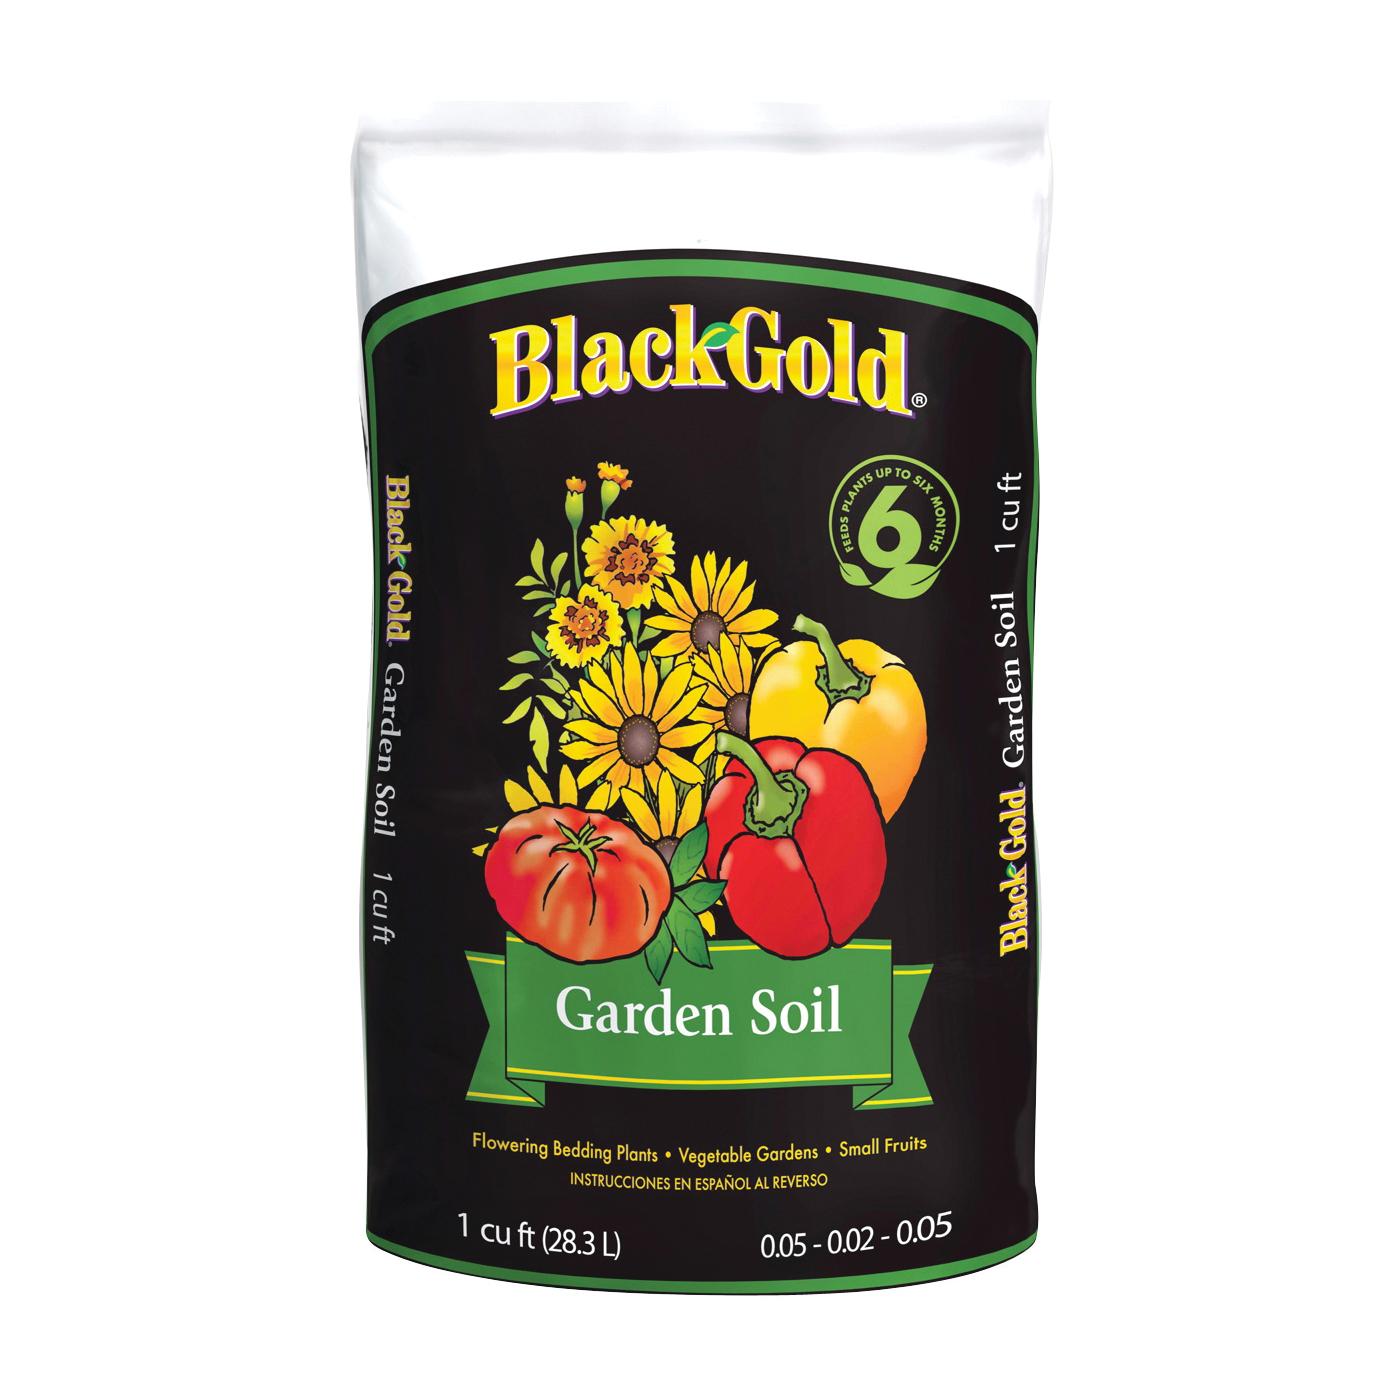 Picture of sun gro BLACK GOLD 1411603.CFL001 Garden Soil, 1 cu-ft Package, Bag